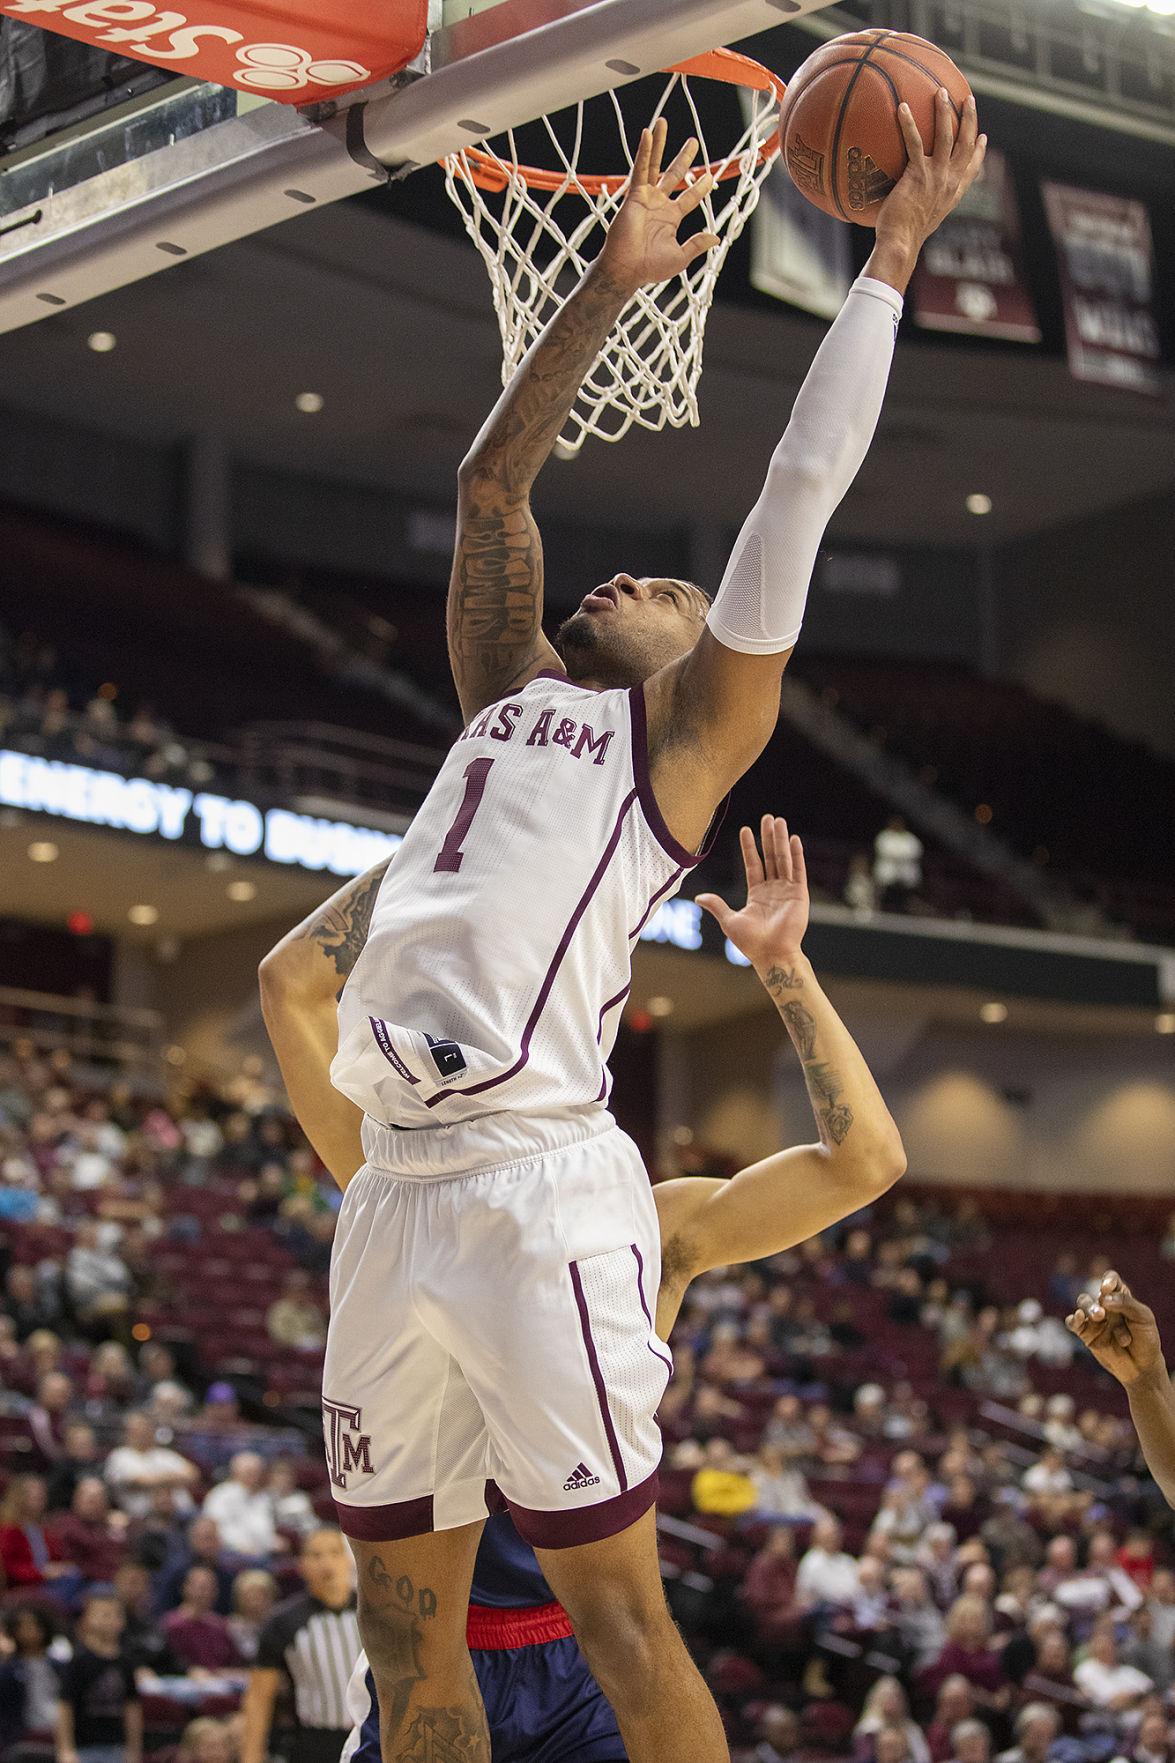 Texas A&M men's basketball vs Ole Miss